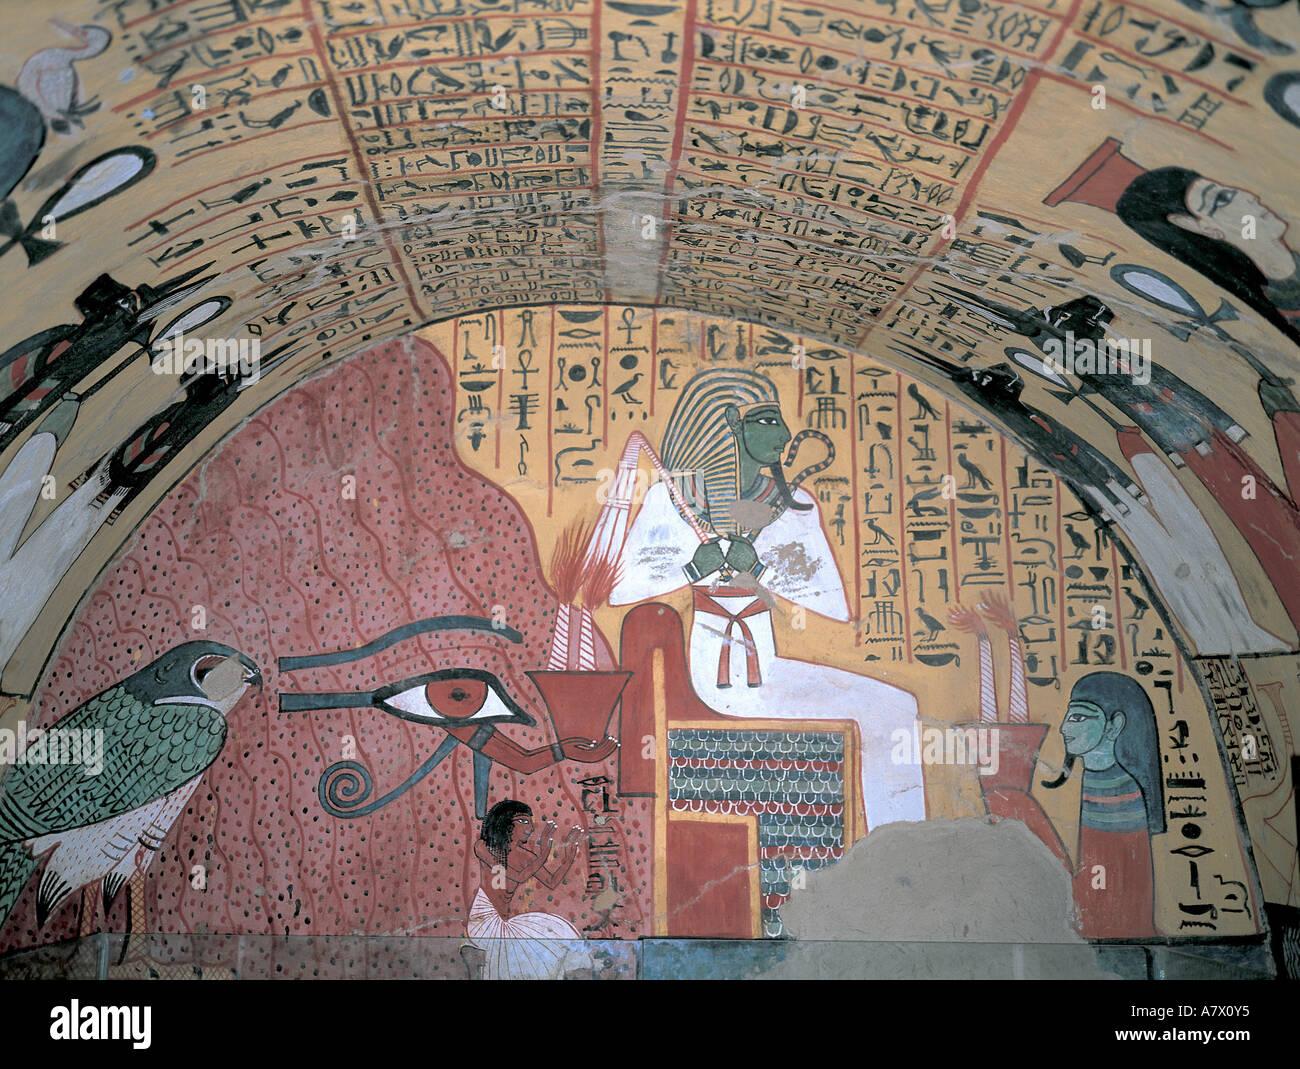 Egypt, Nile valley, Luxor region, Deir al-Madinah village, Pached's tomb, Osiris God and the Eye of Horus - Stock Image